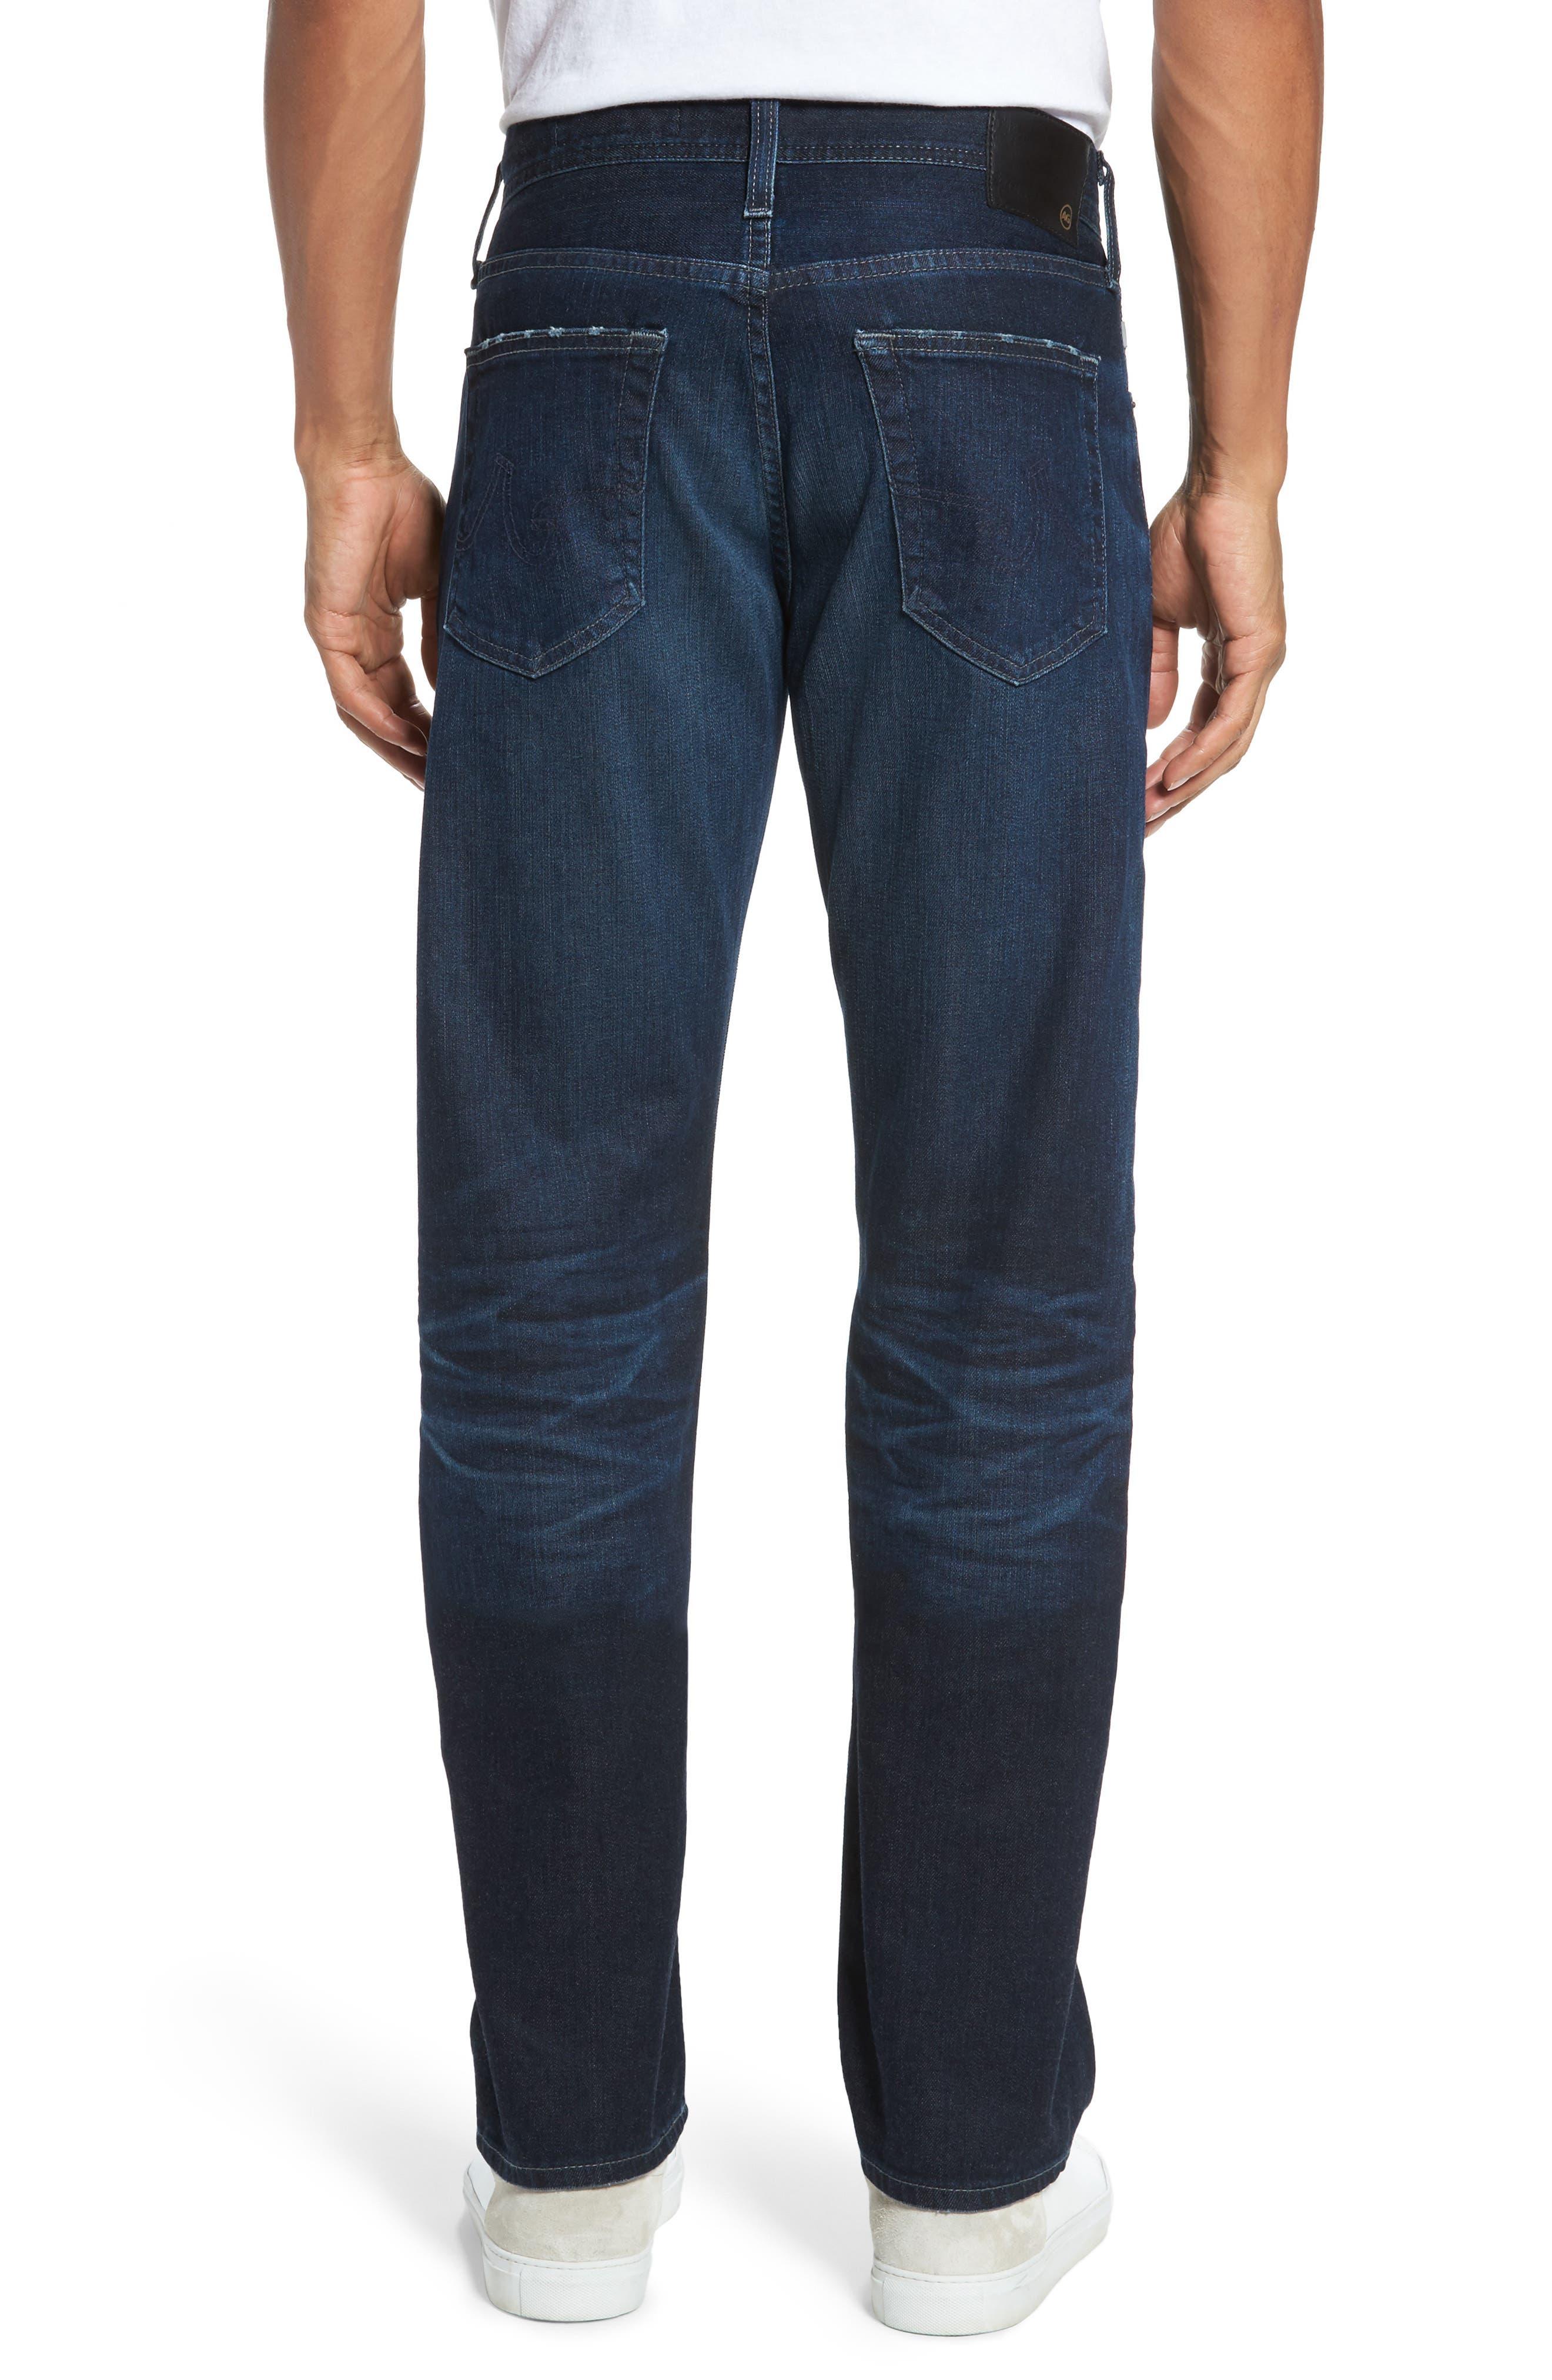 Graduate Slim Straight Fit Jeans,                             Alternate thumbnail 2, color,                             482